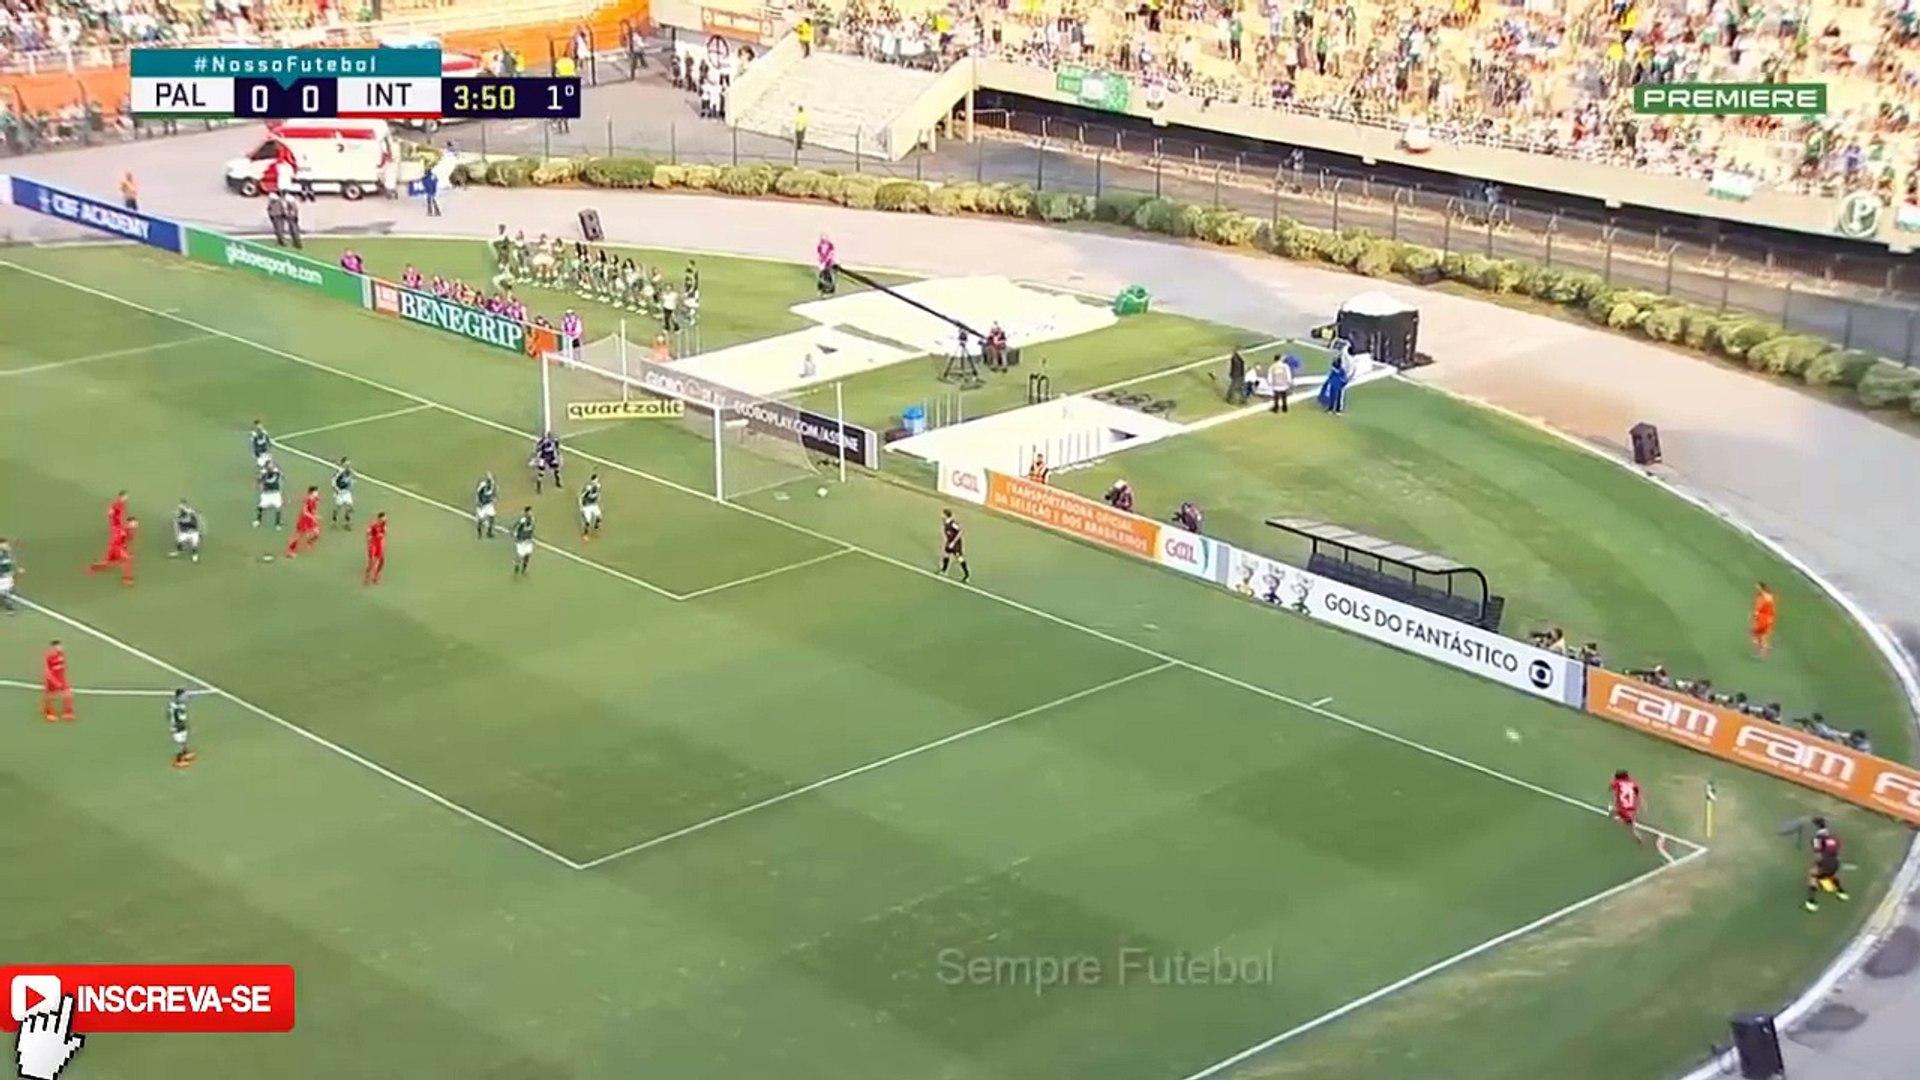 Palmeiras 1 x 0 Internacional - Melhores Momentos (1 TEMPO) Campeonato Brasileiro 2018